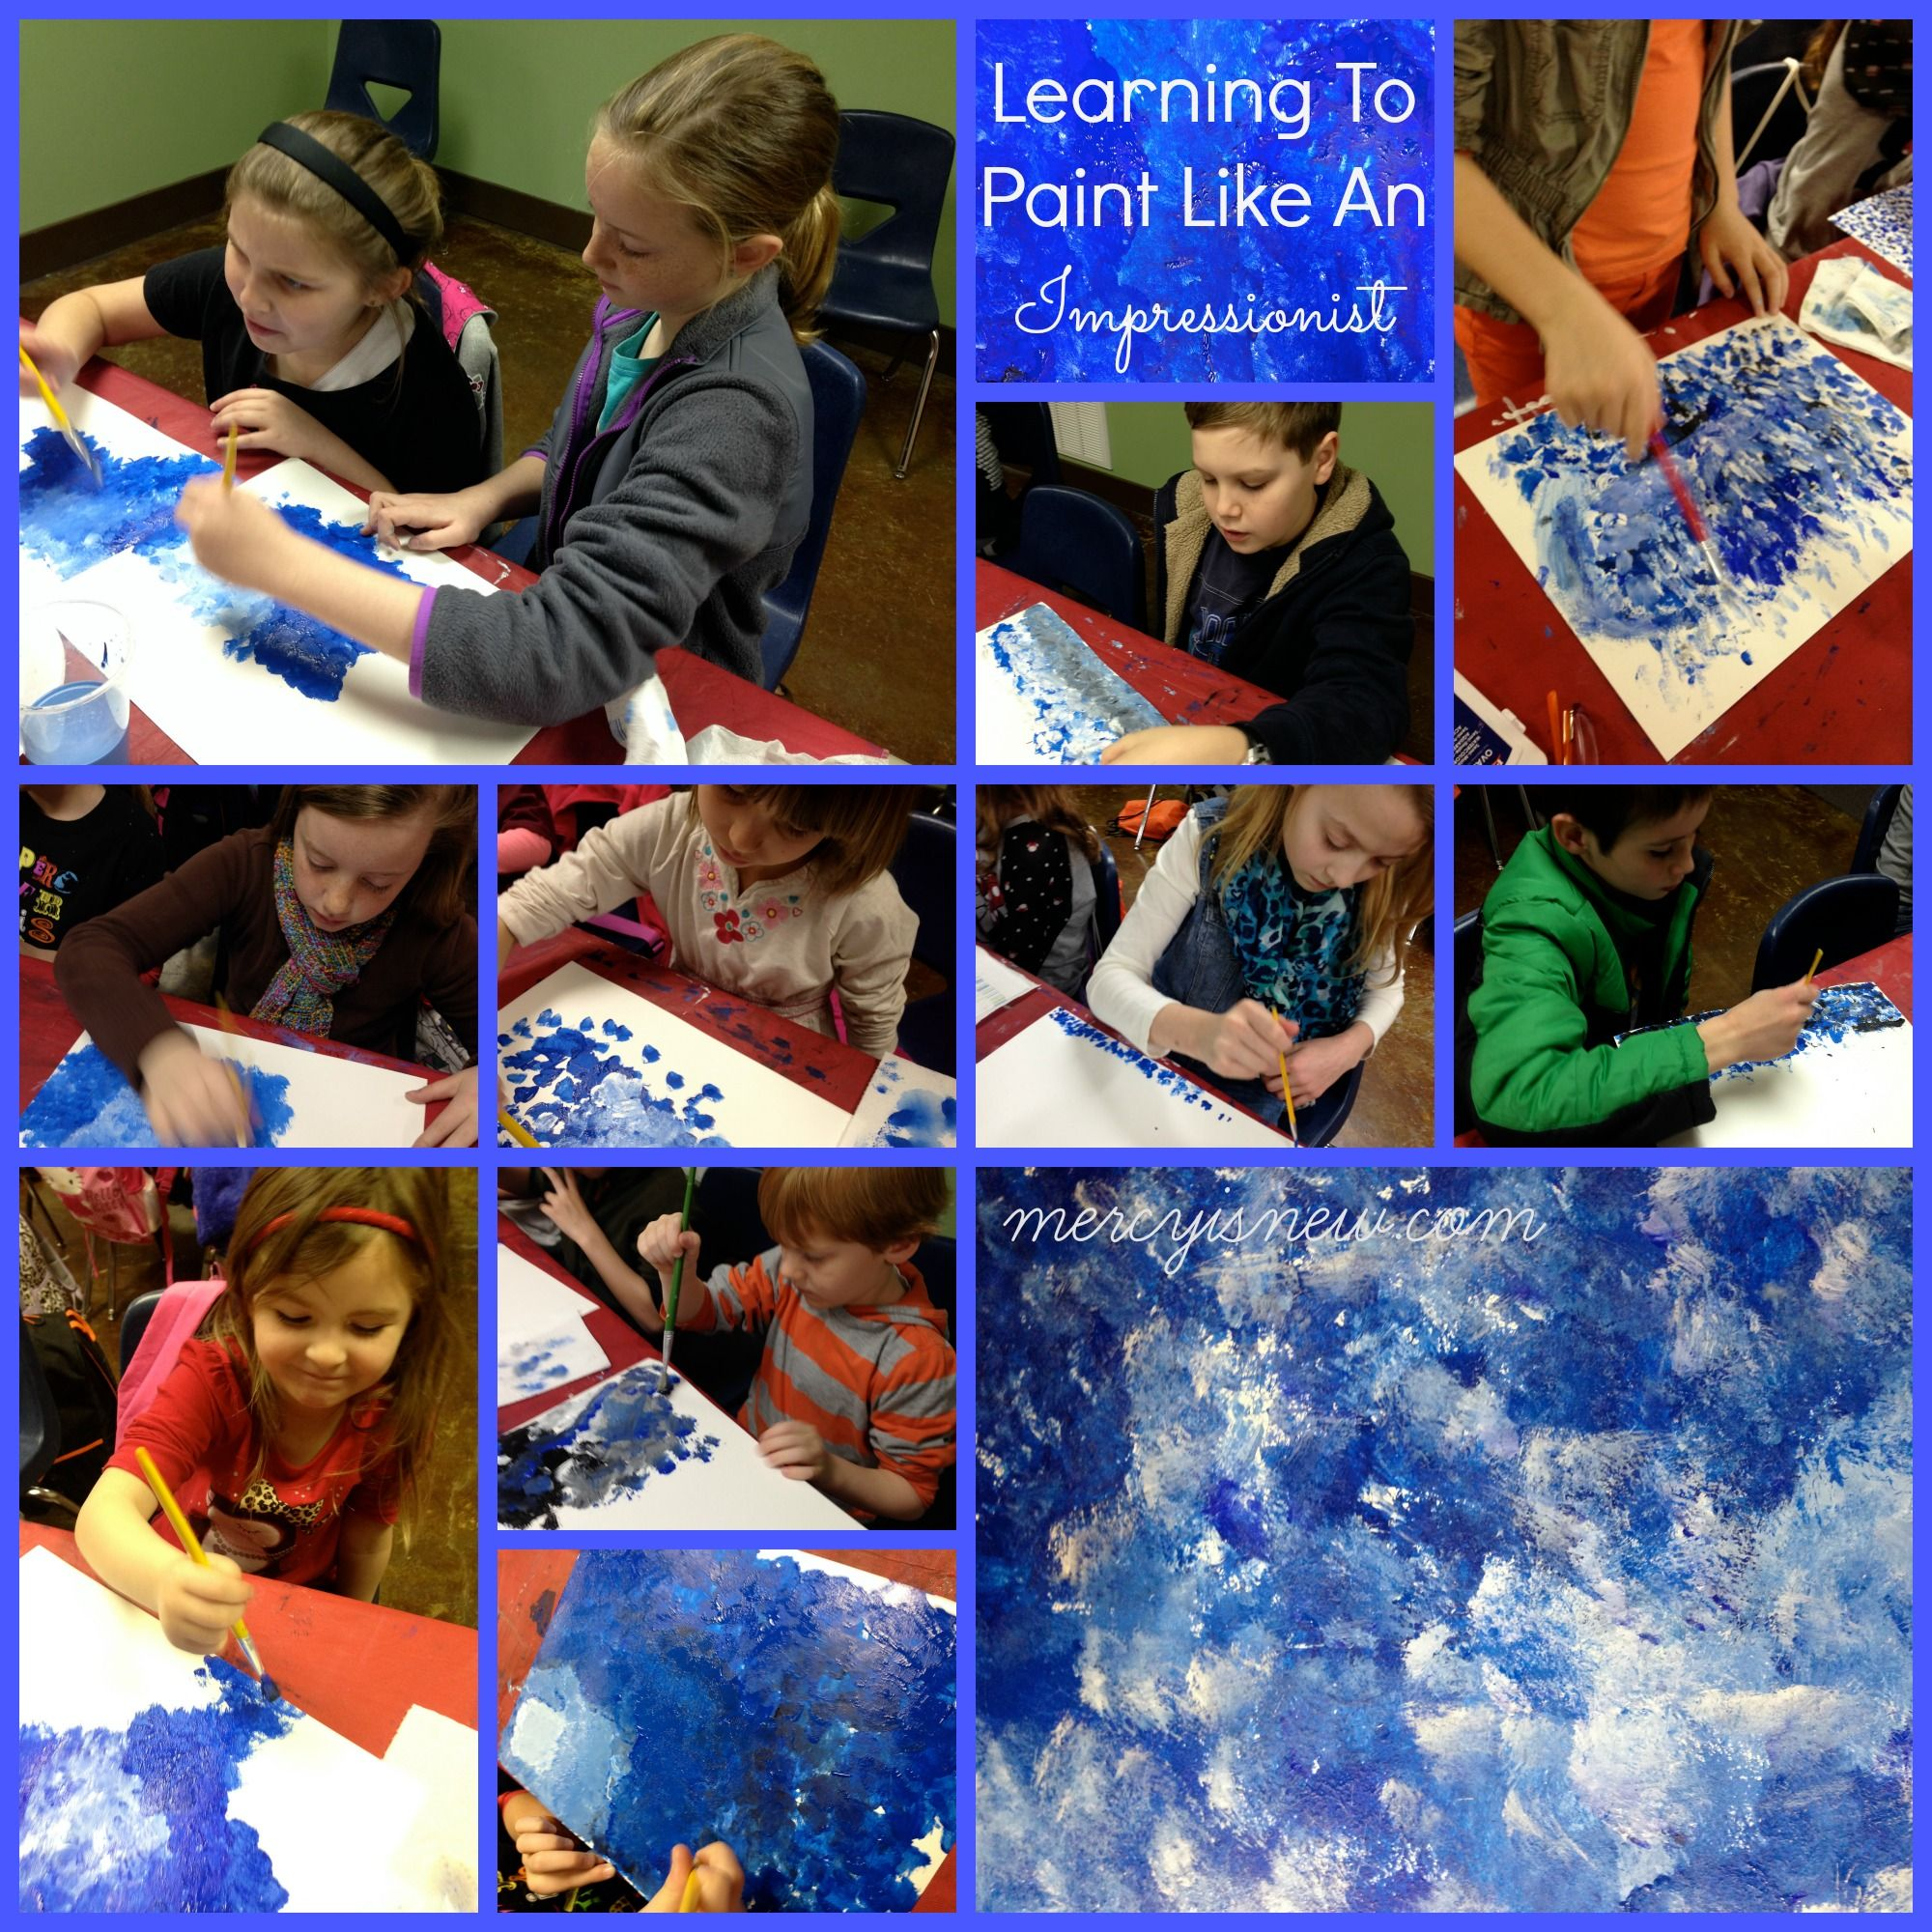 Teaching Kids To Paint Like An Impressionist